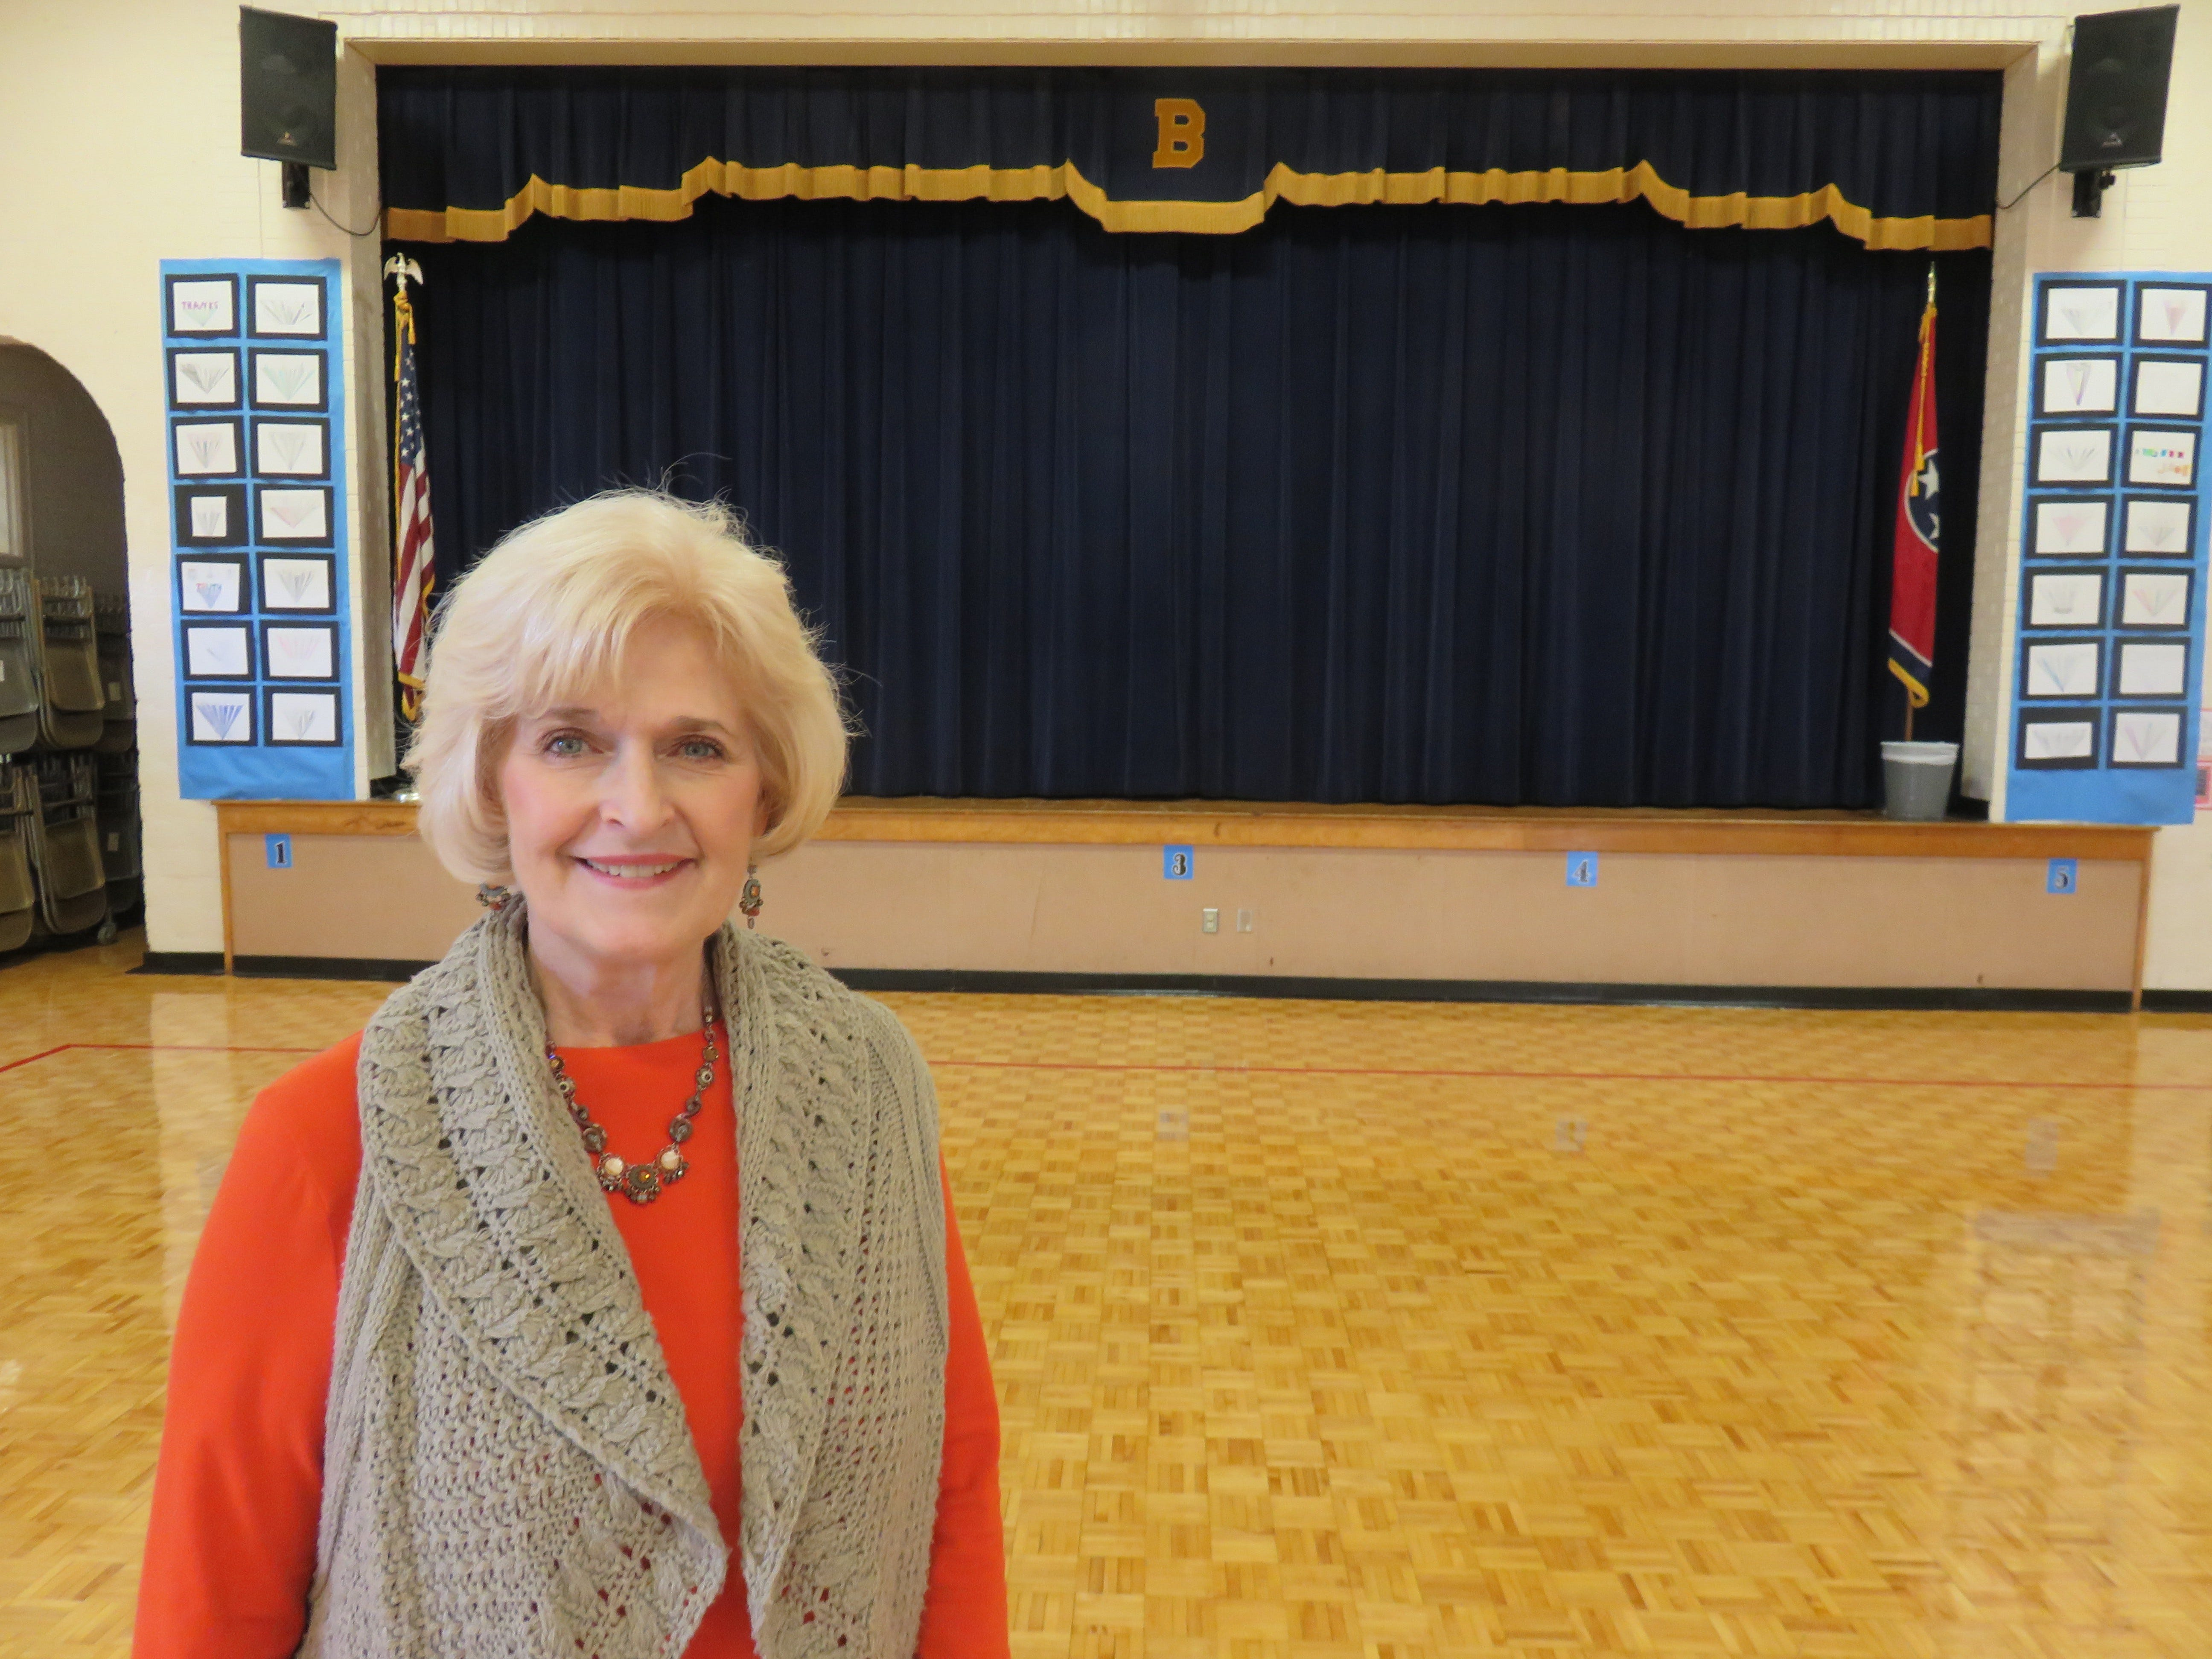 Principal Susan Dunlap in front of gym stage.